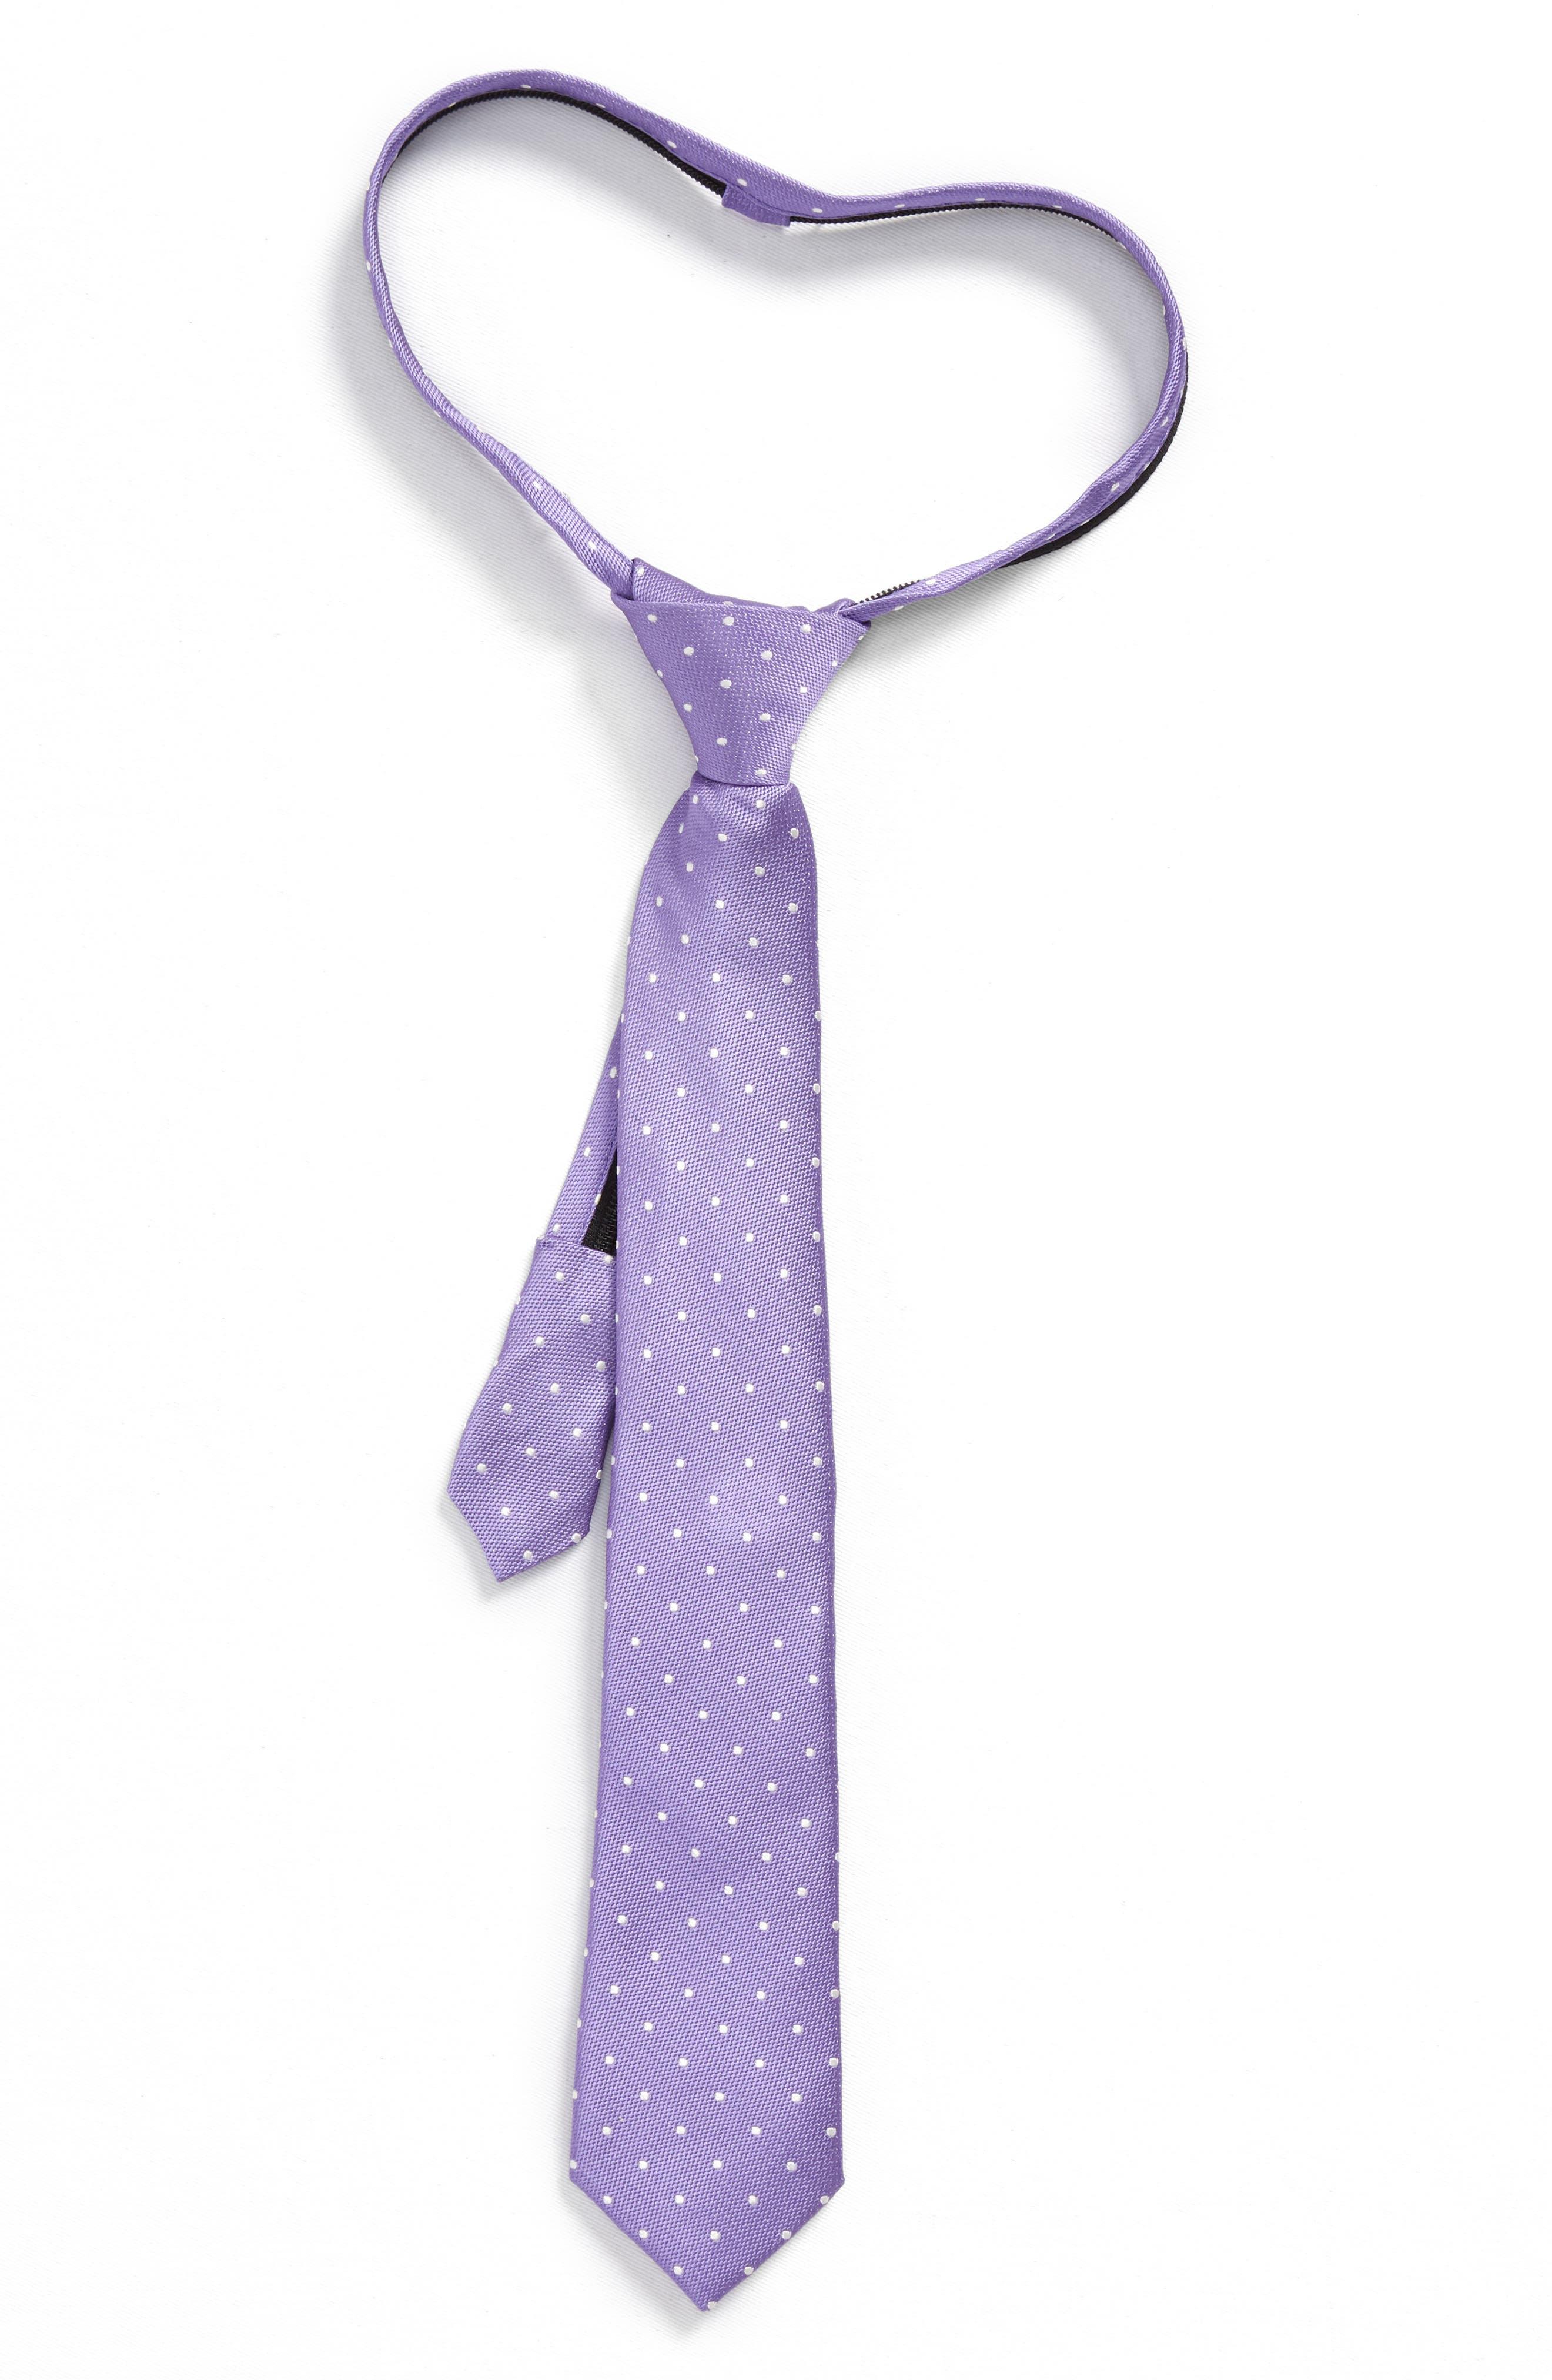 Dainty Dot Silk Zip Tie,                             Main thumbnail 1, color,                             500